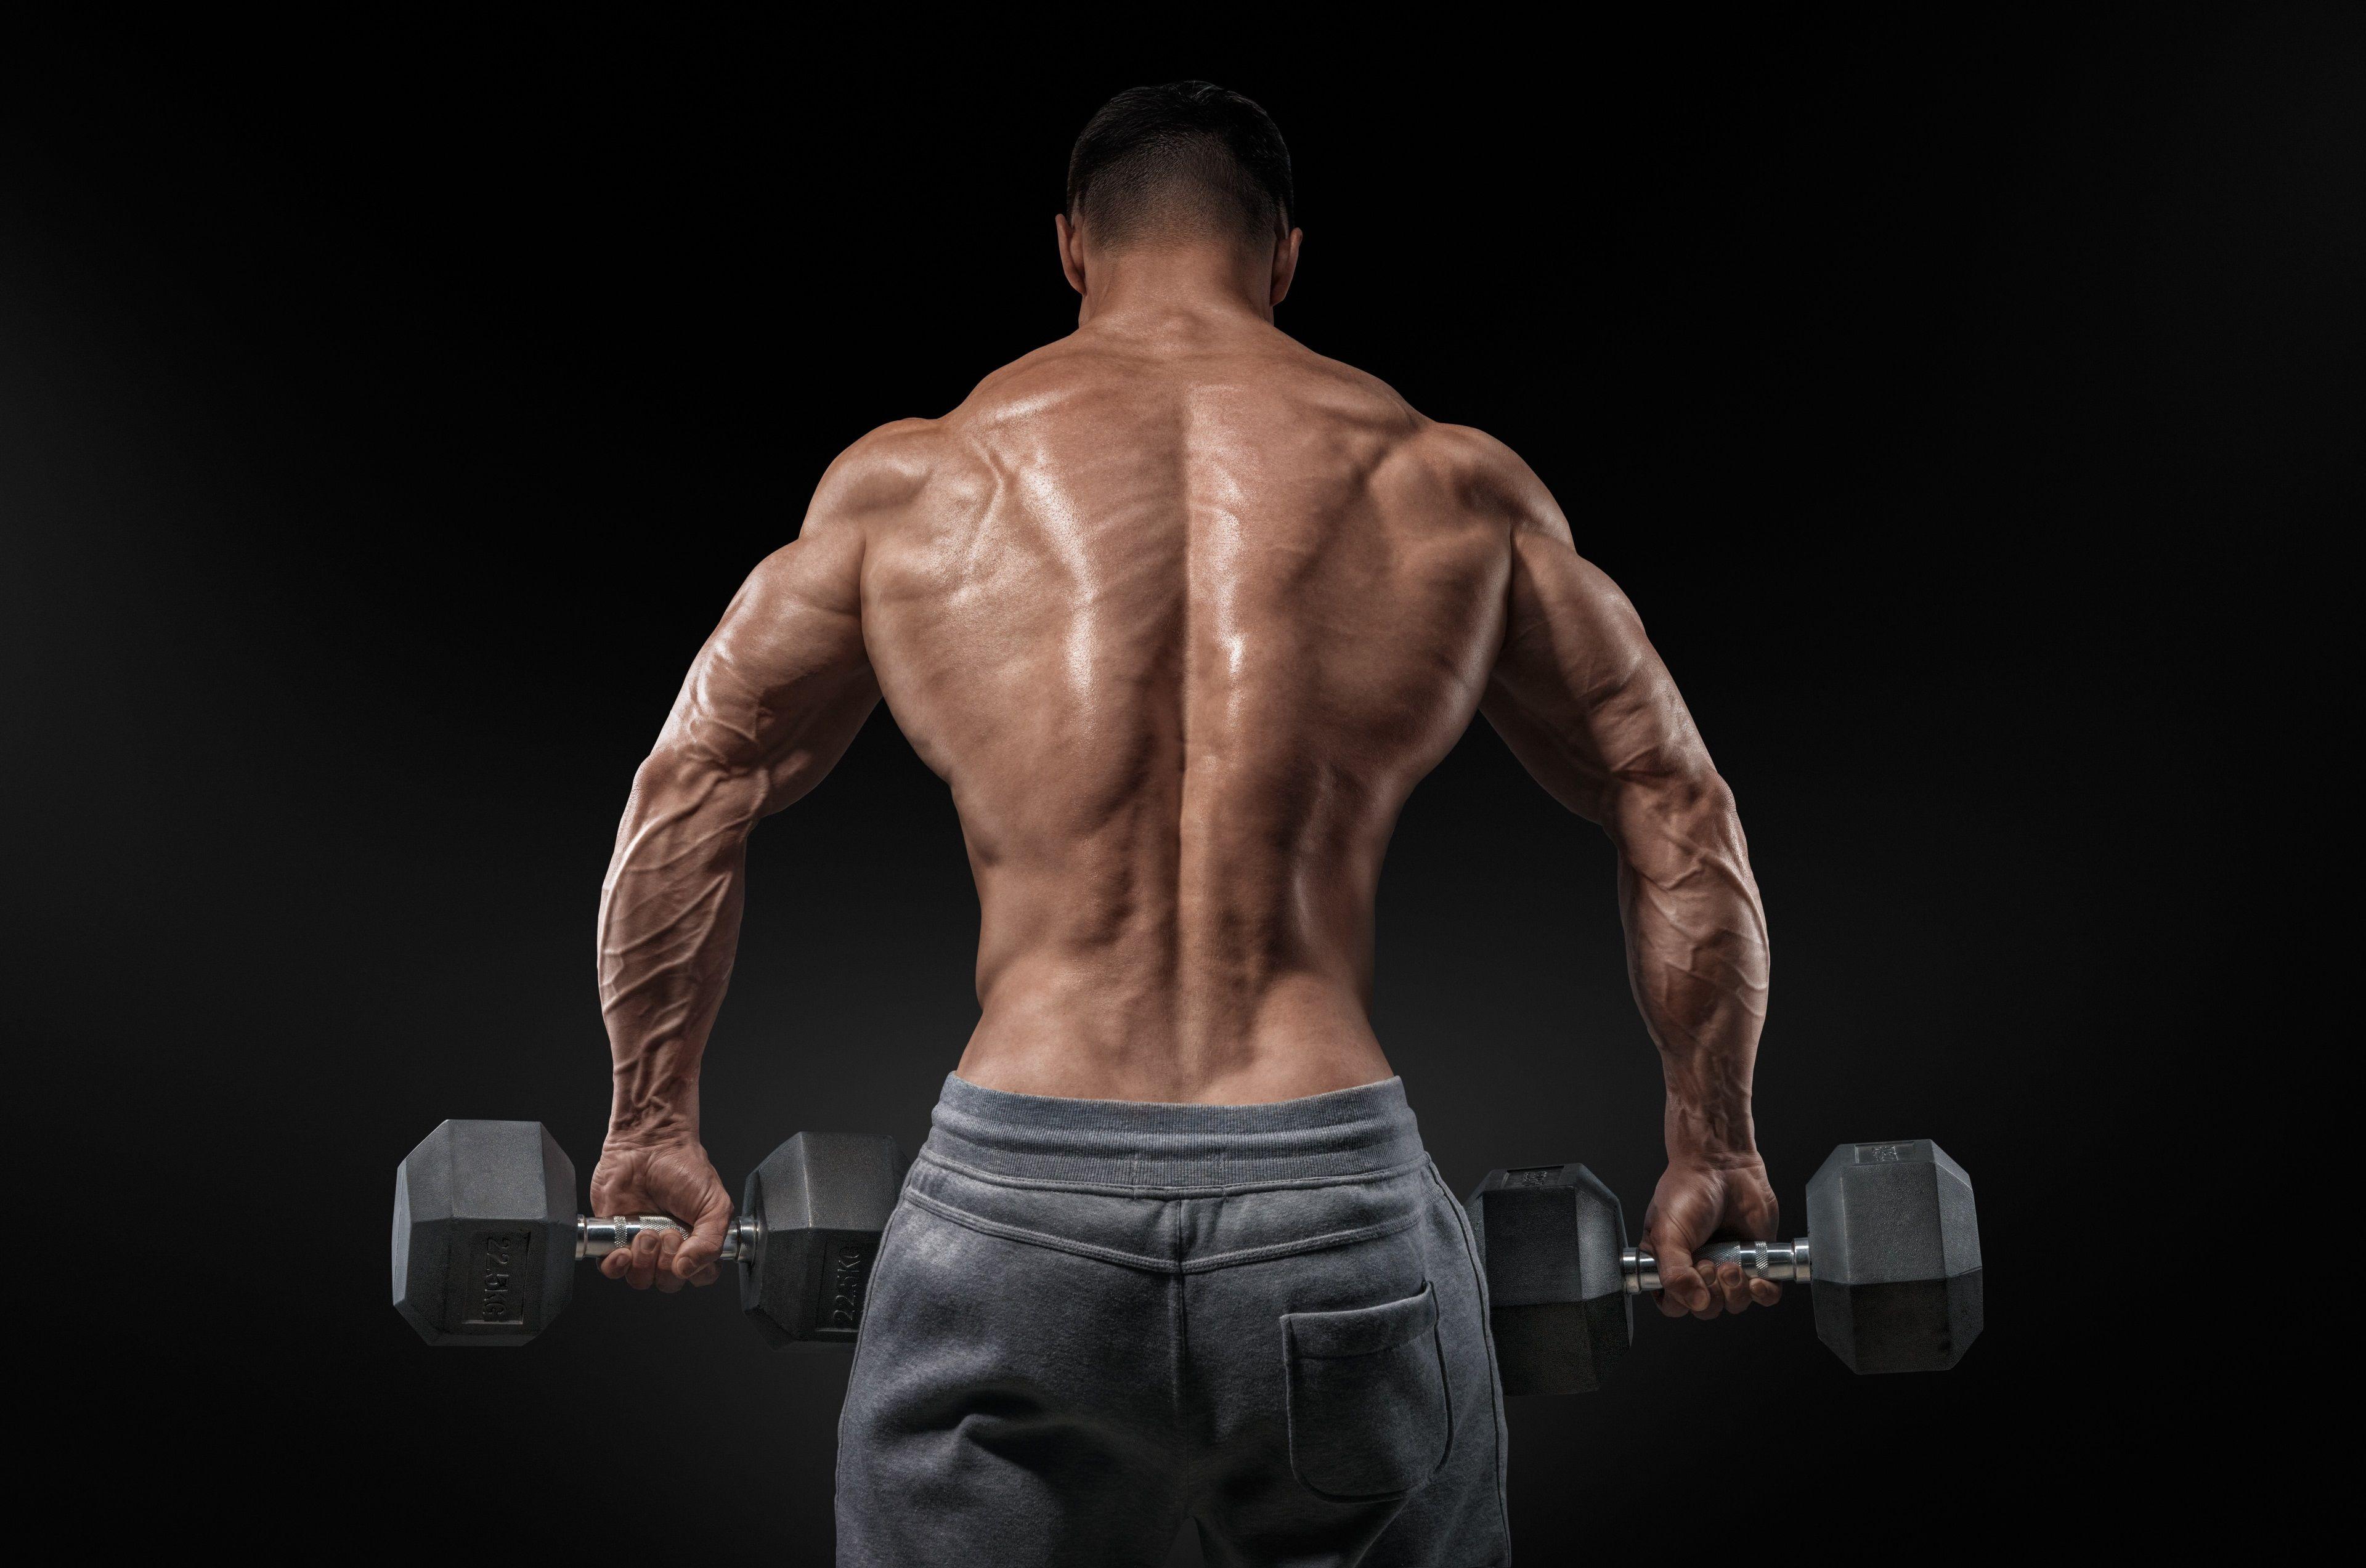 3840x2545 Bodybuilding 4k Free Wallpaper Background Bodybuilding Bodybuilding Photography Dumbbell Back Workout